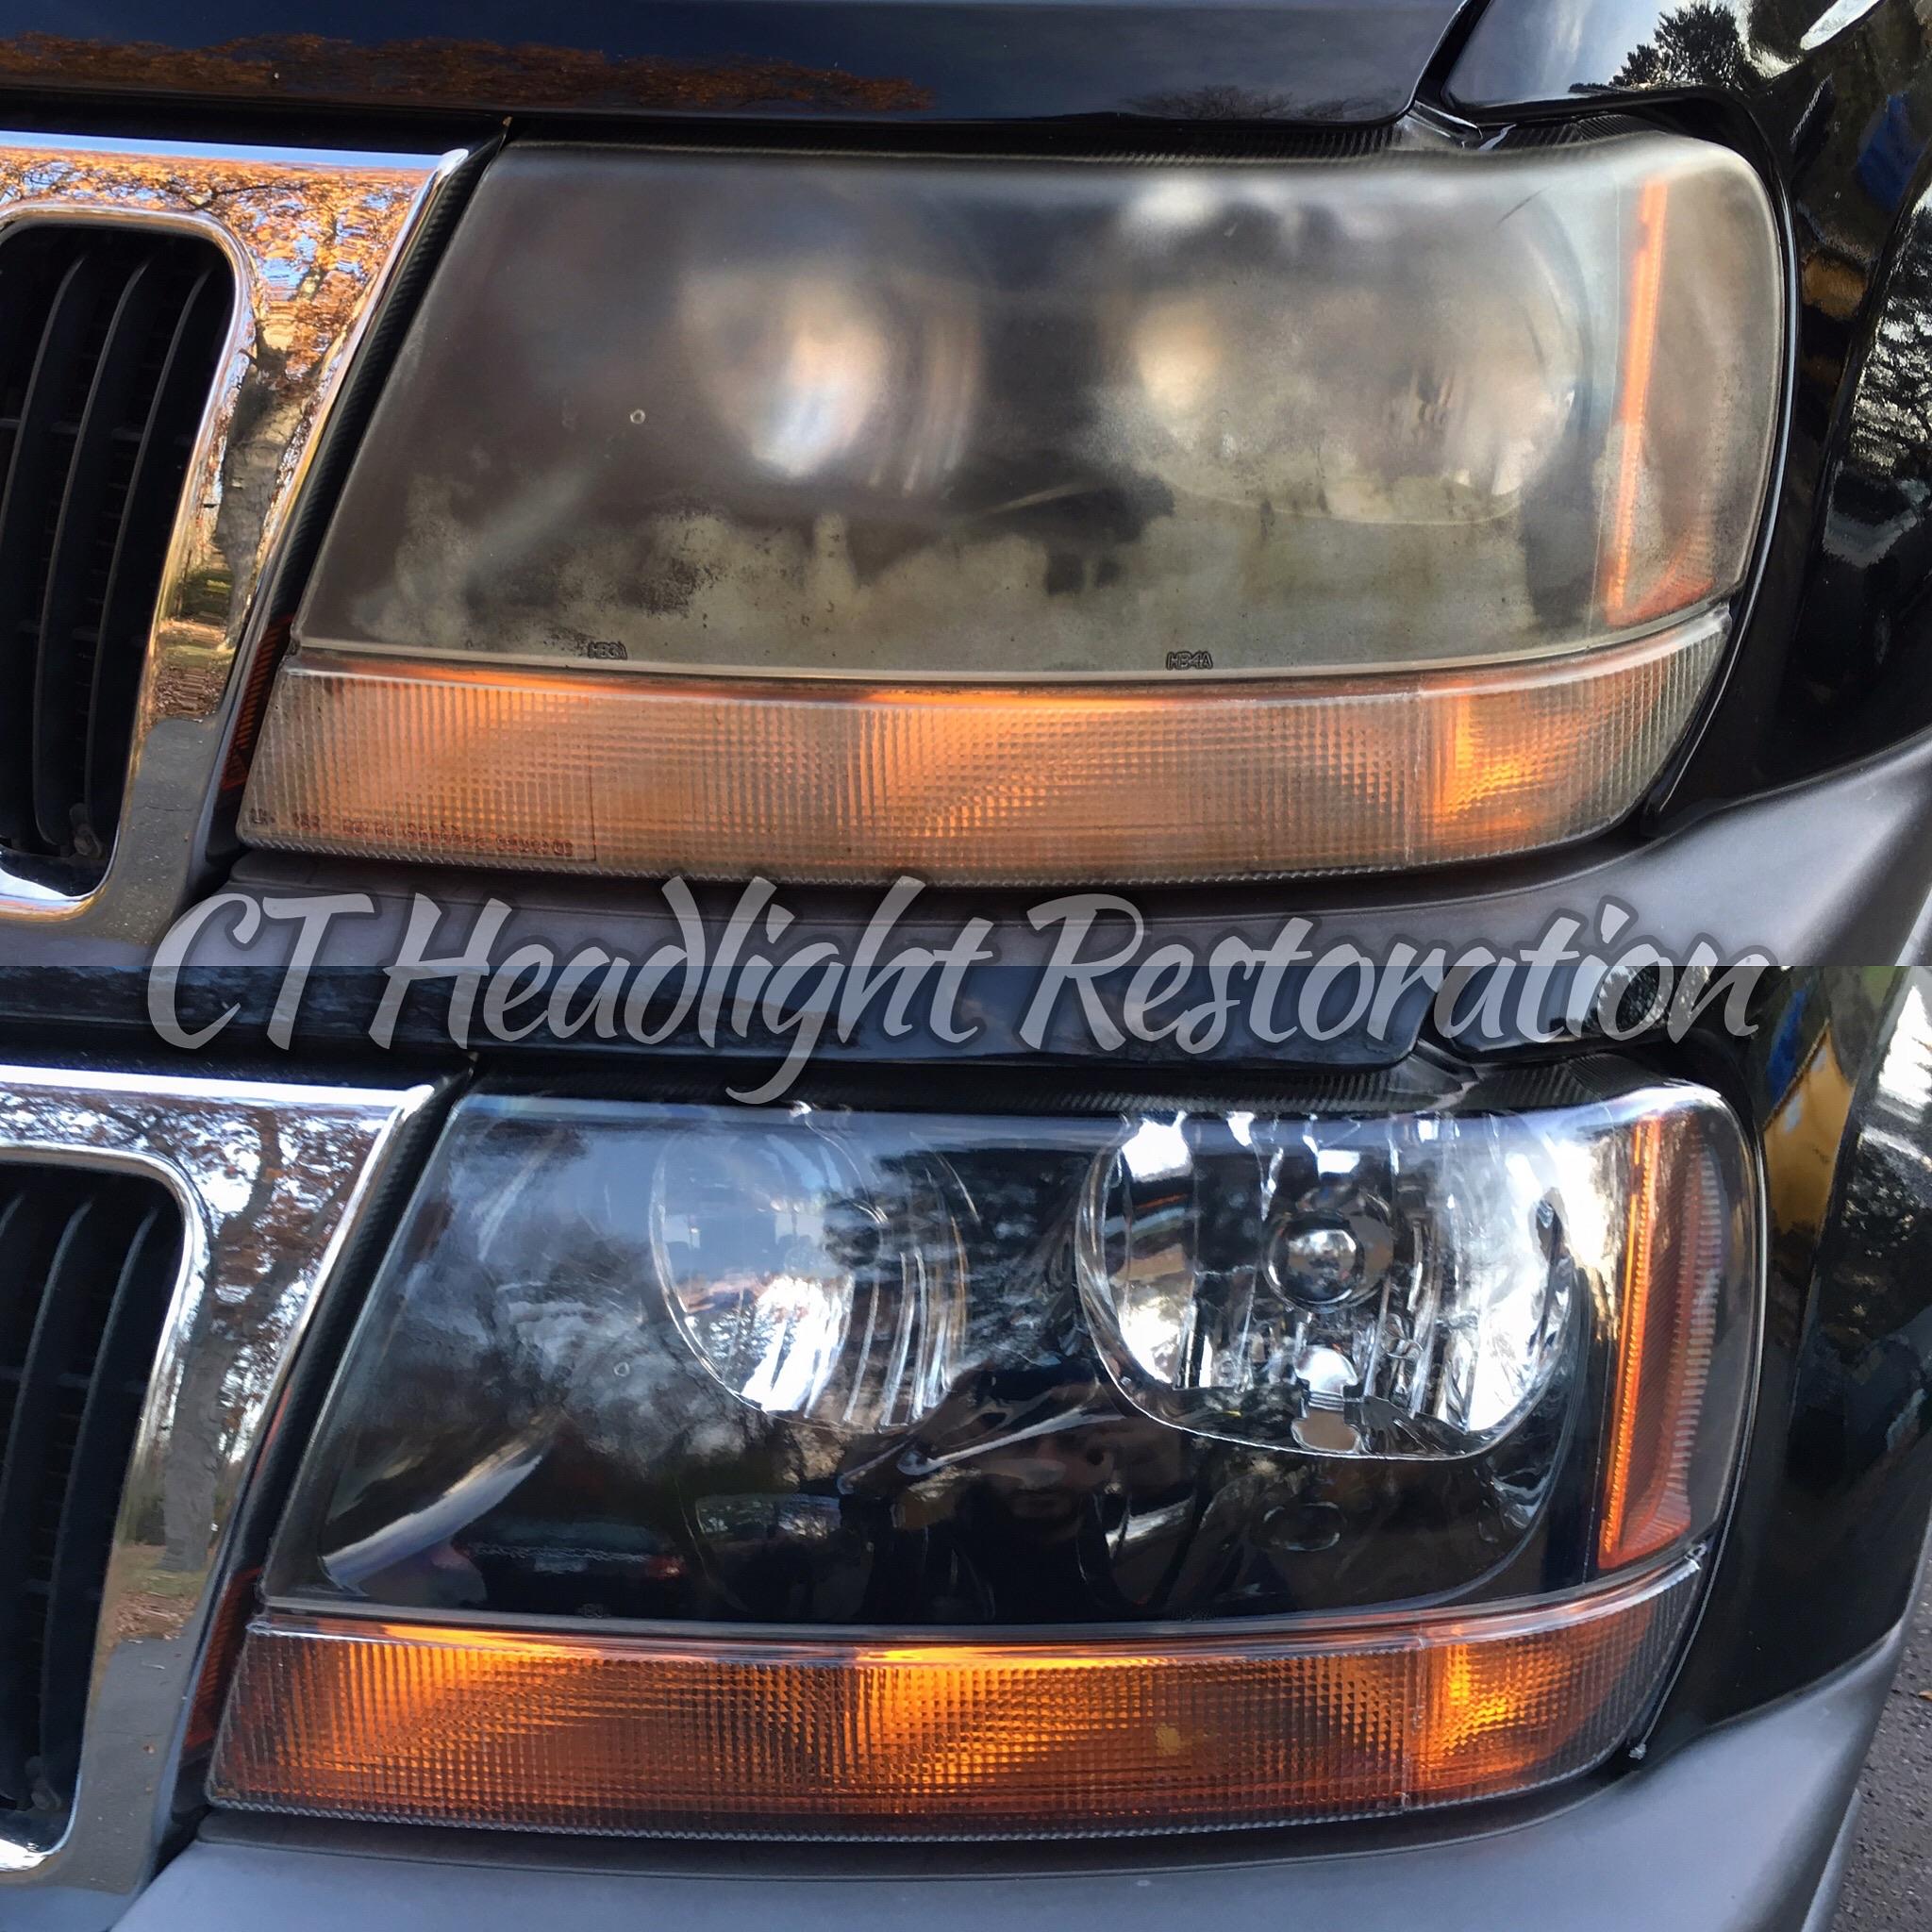 Jeep Grand Cherokee Connecticut Headlight Restoration.jpg